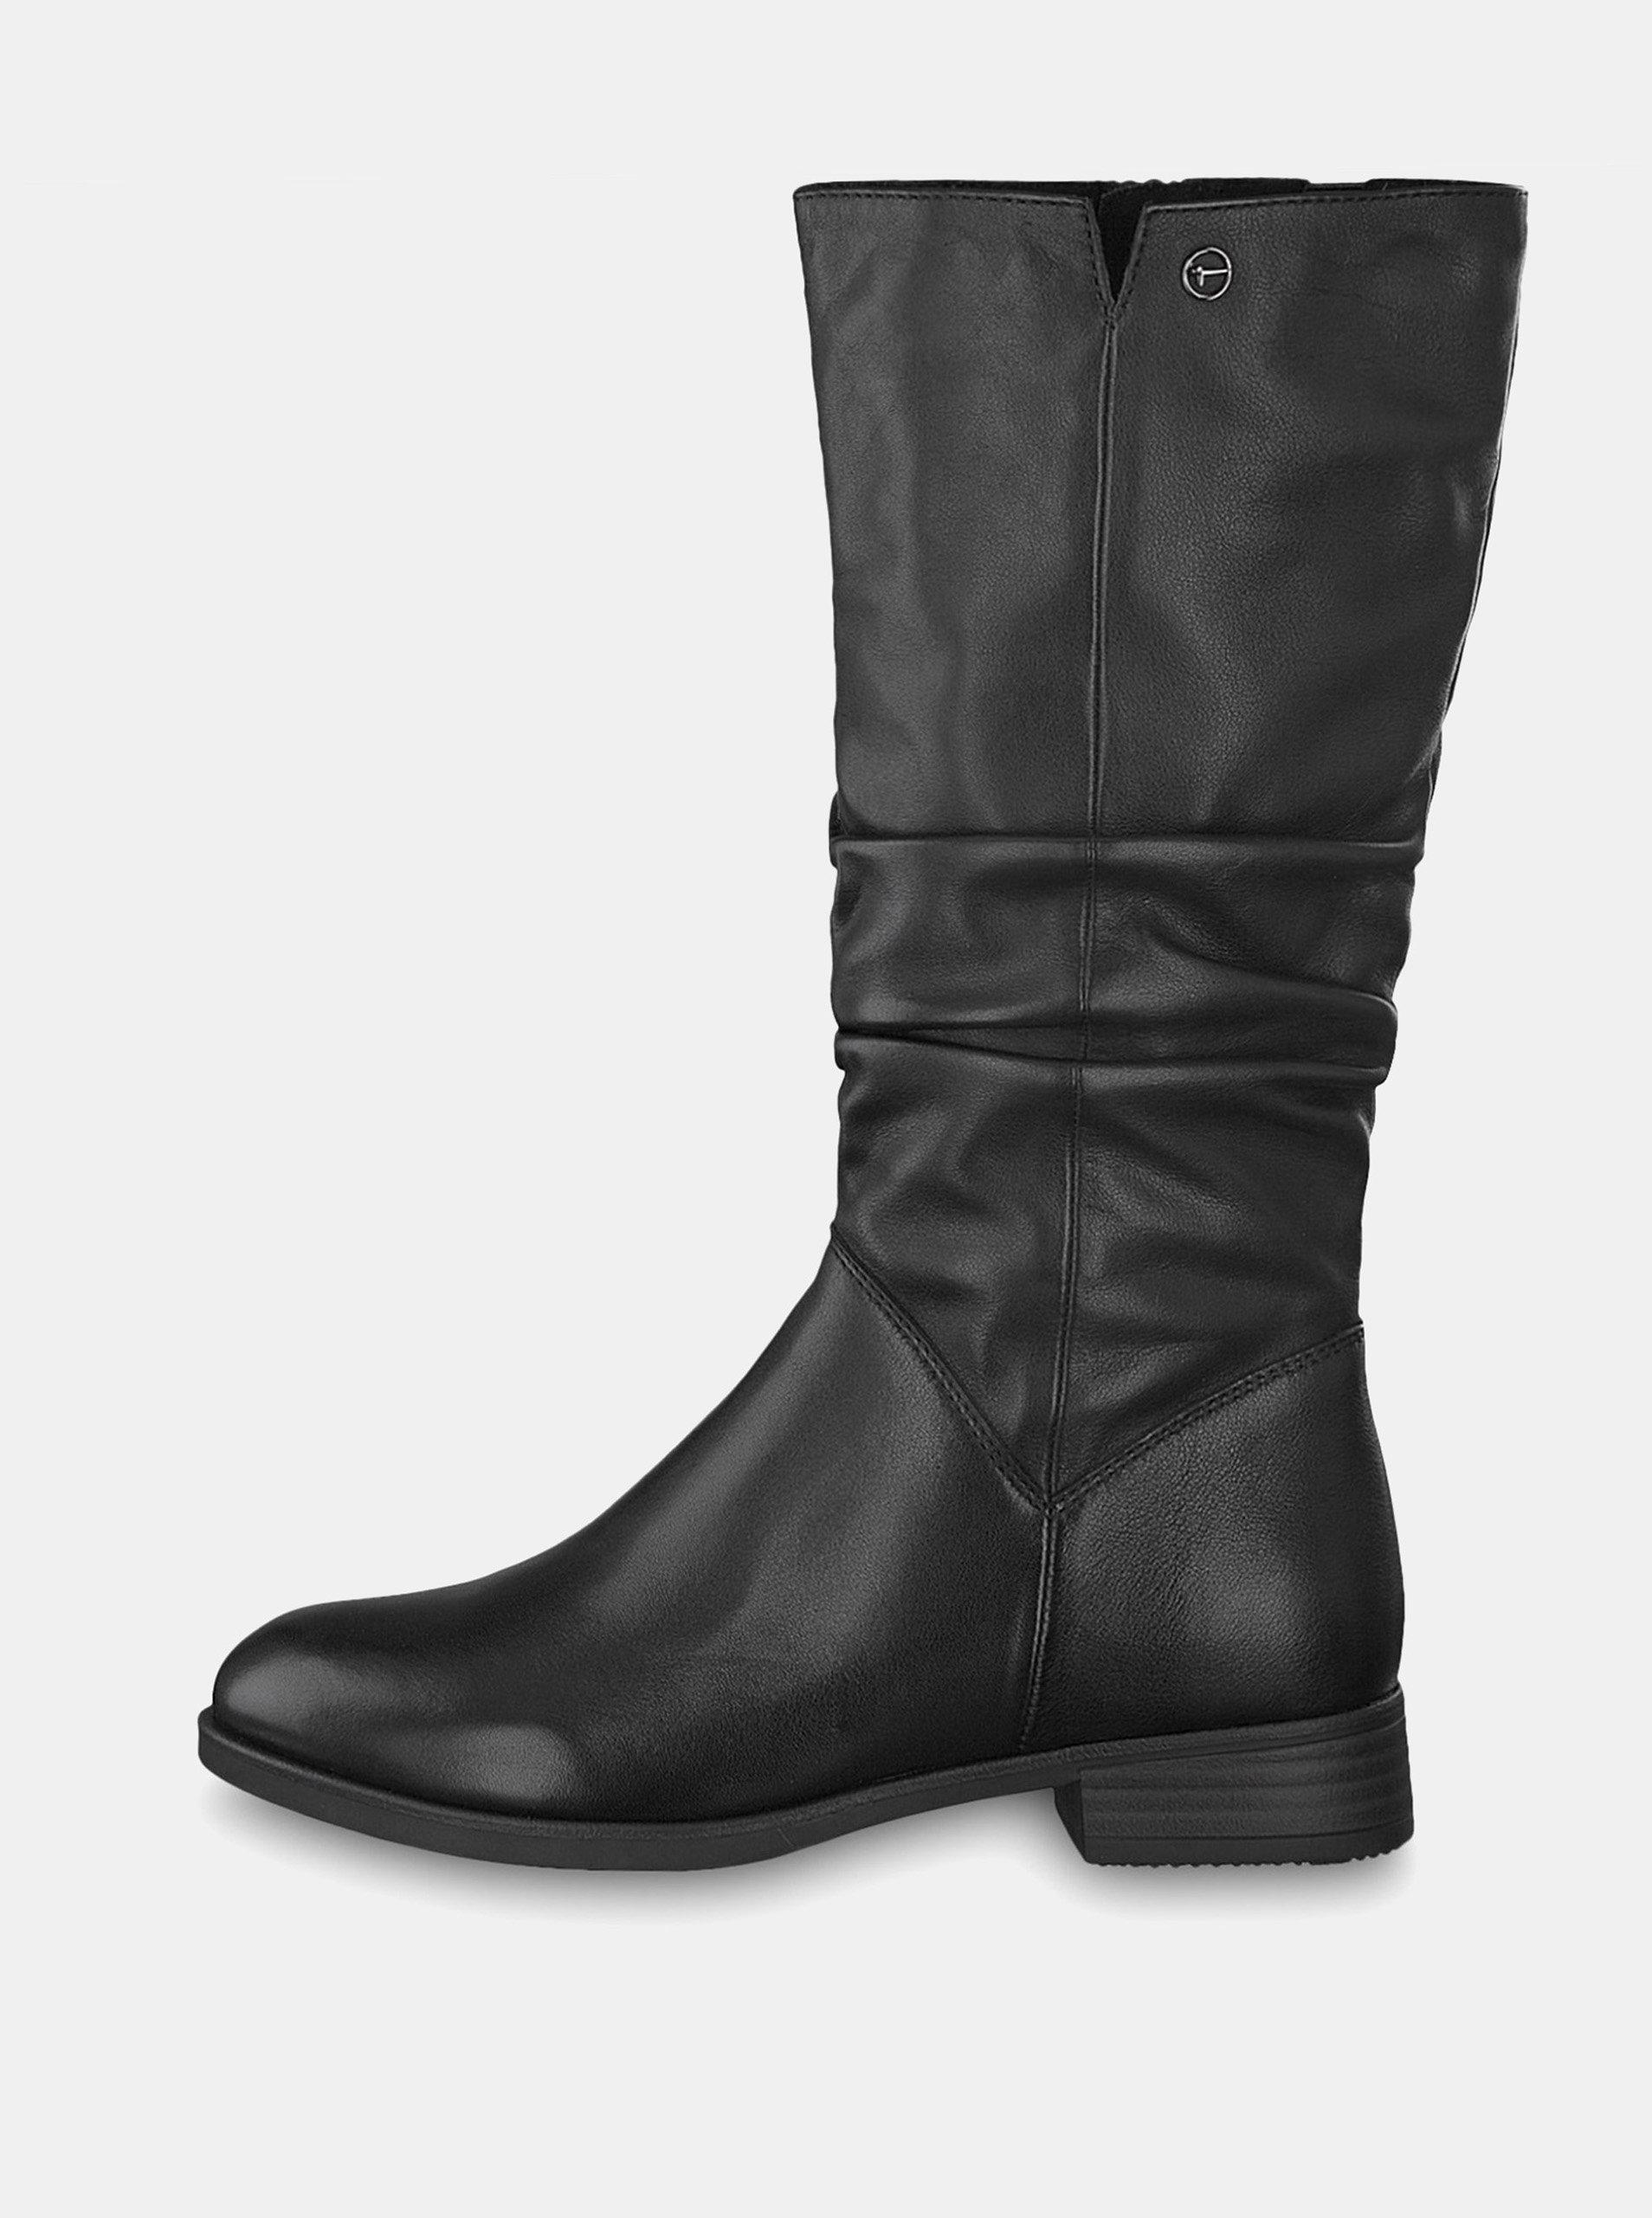 0b701baac491d Čierne kožené čižmy Tamaris | ZOOT.sk